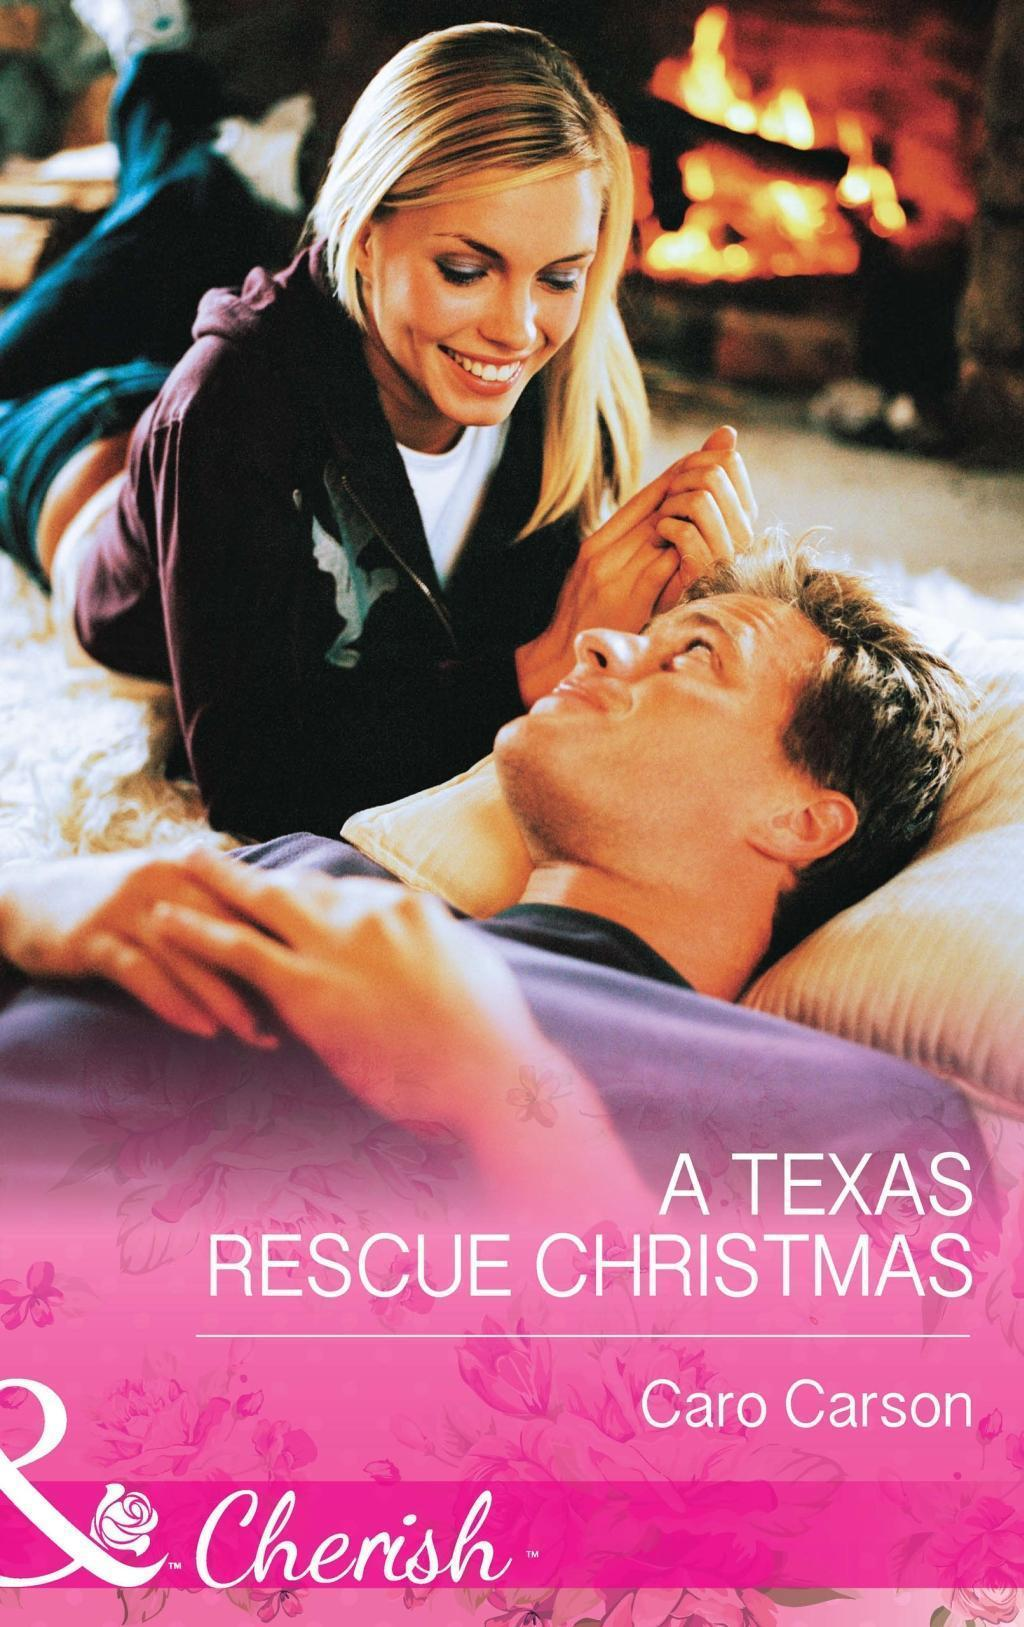 A Texas Rescue Christmas (Mills & Boon Cherish) (Texas Rescue, Book 2)